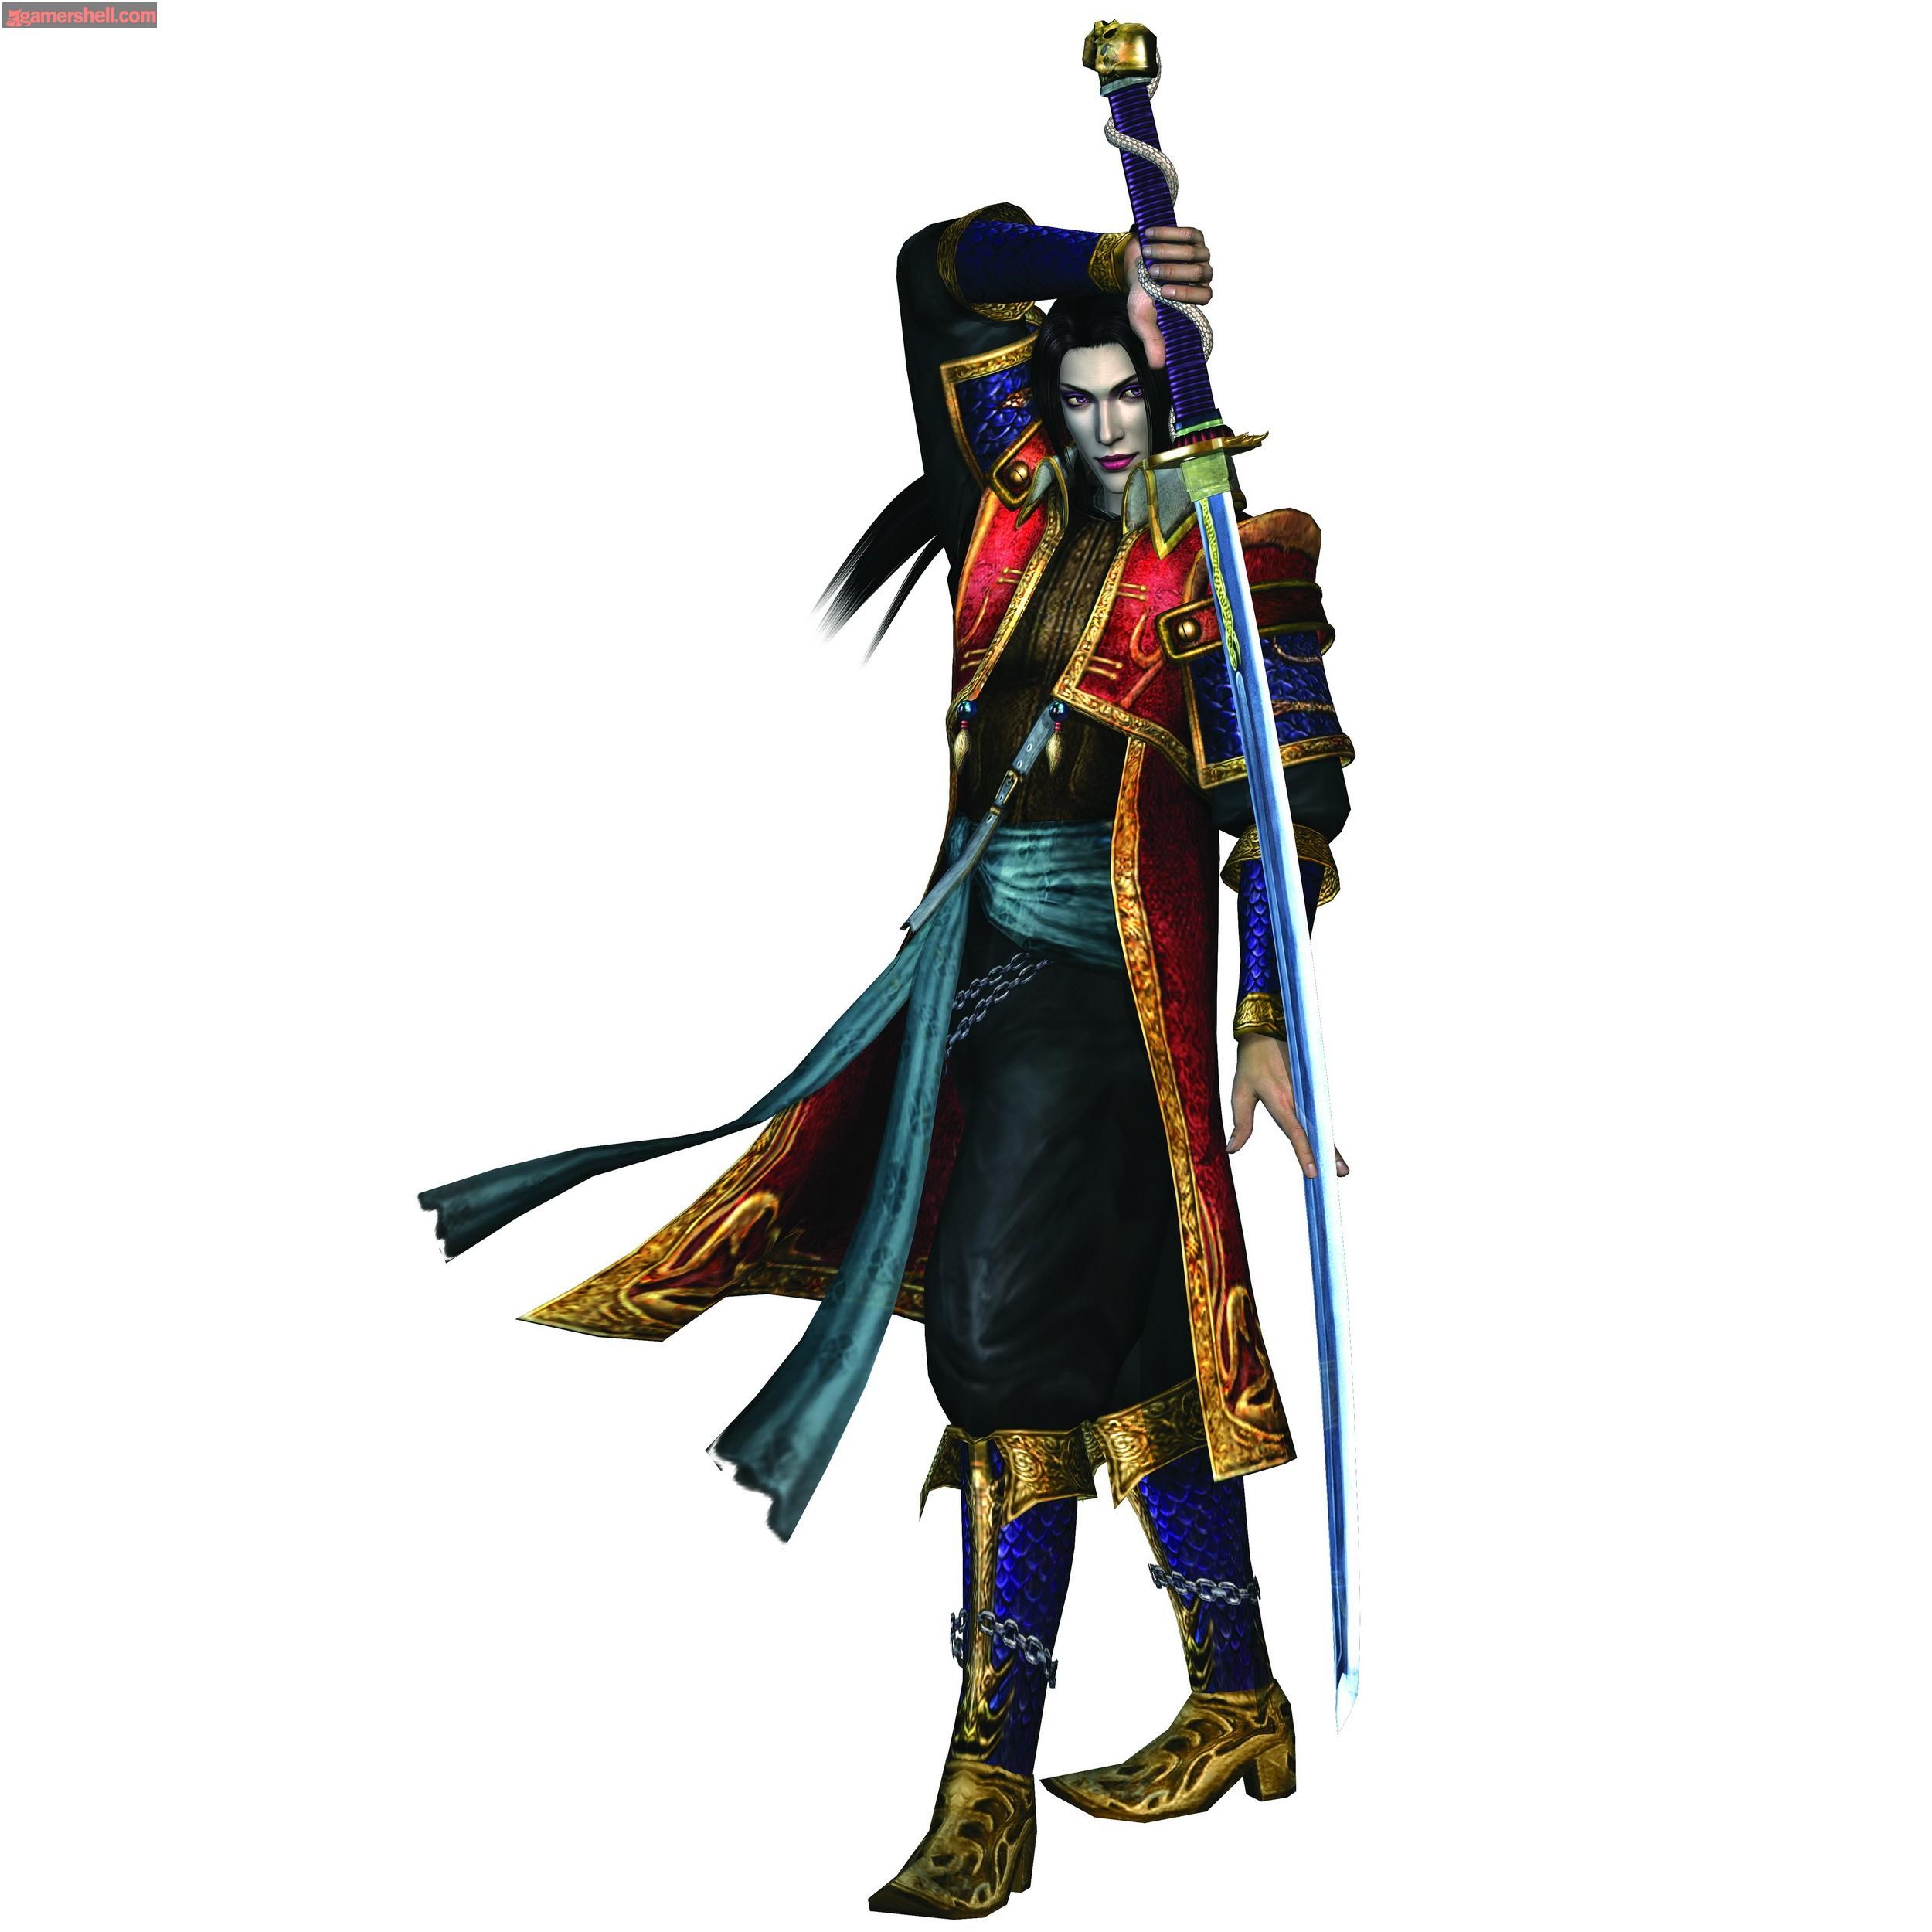 Warriors Orochi 3 Character List: FemaleCelebrity